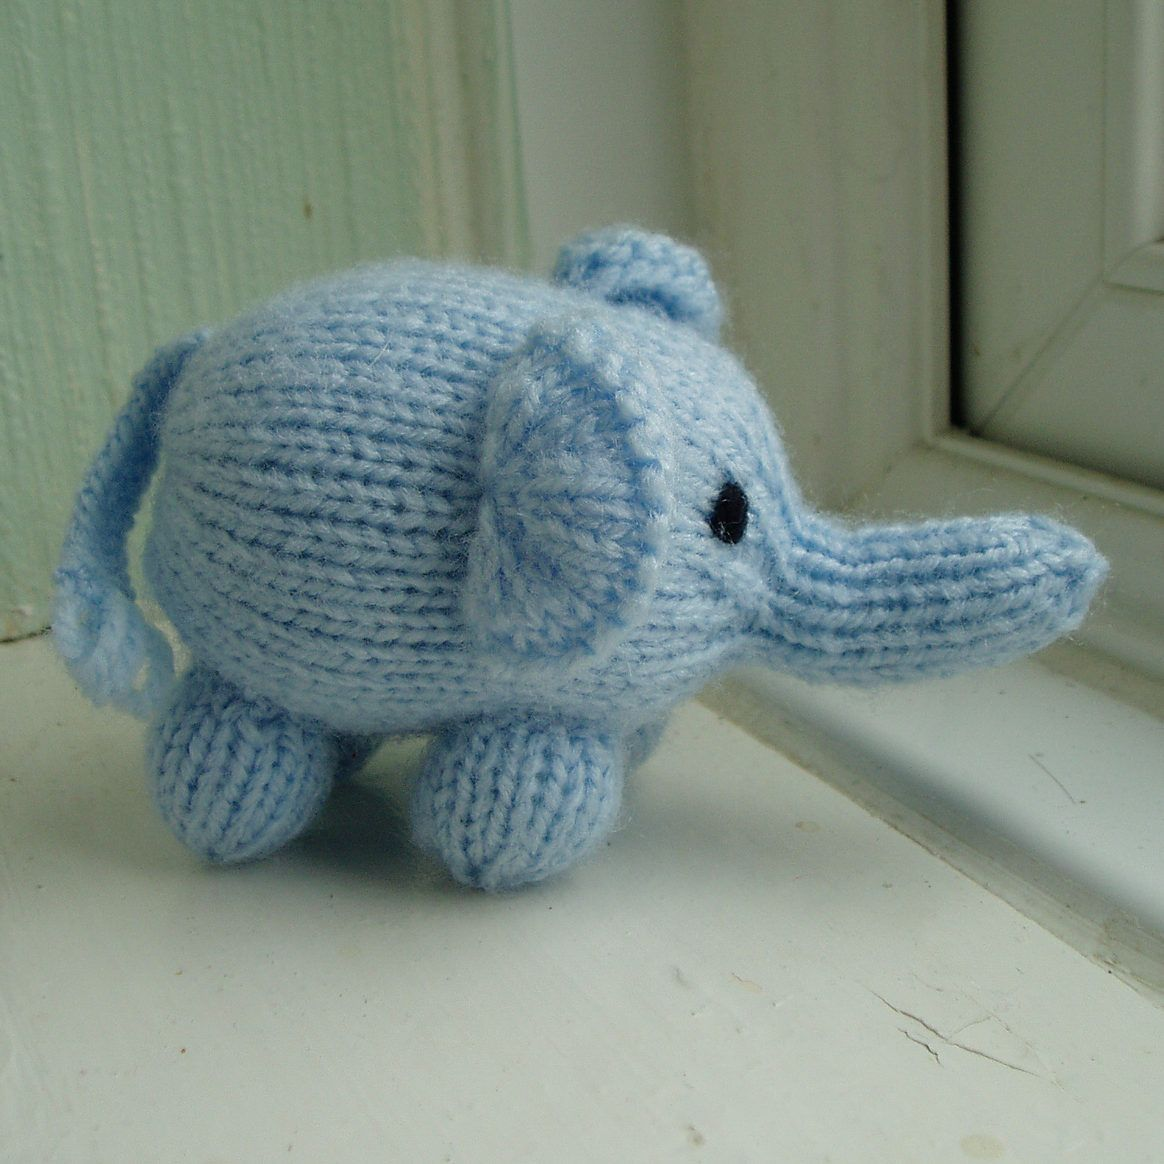 Free Knitting Pattern For Mini Elephant Amigurami Knits